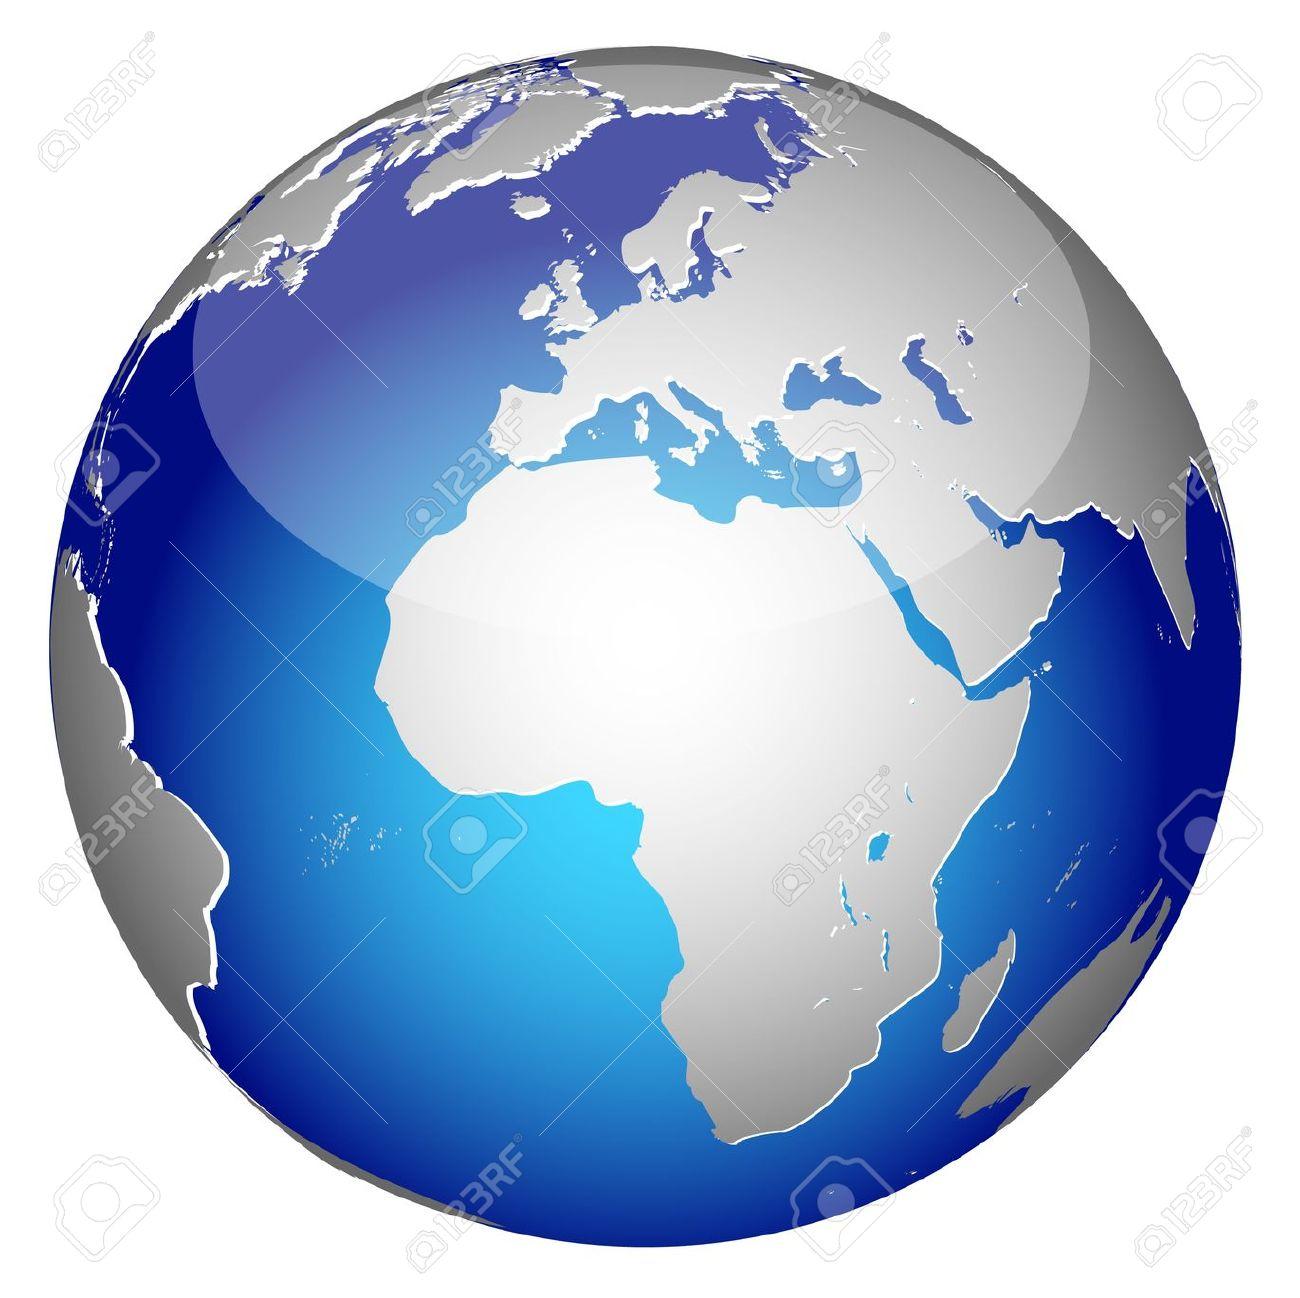 Global free download best. Planeten clipart half world